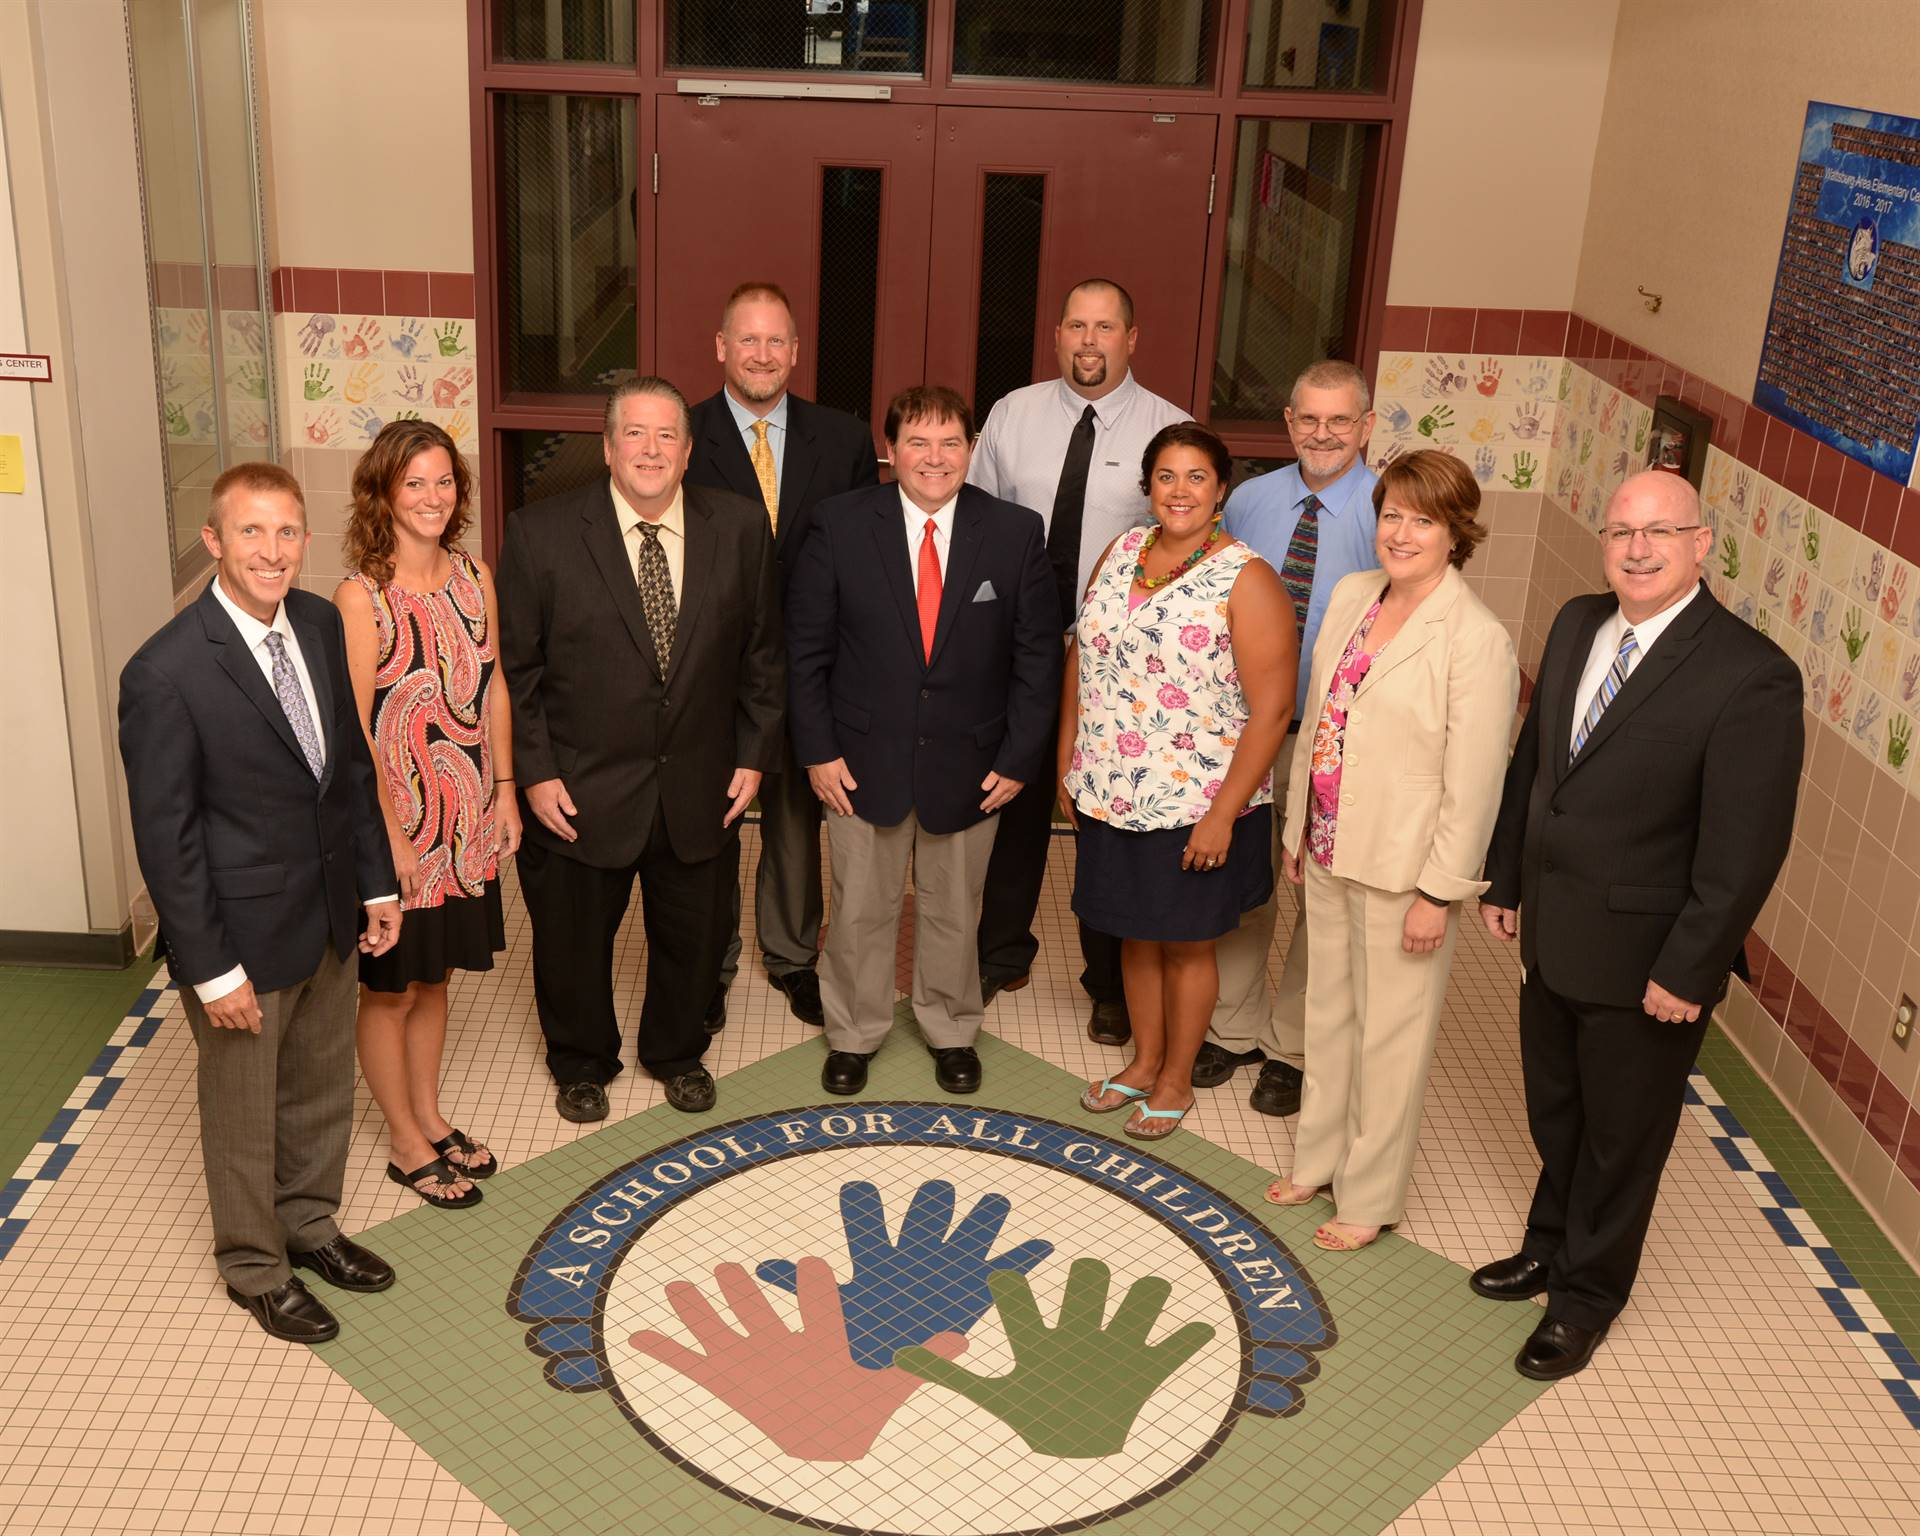 WASD Board of Directors